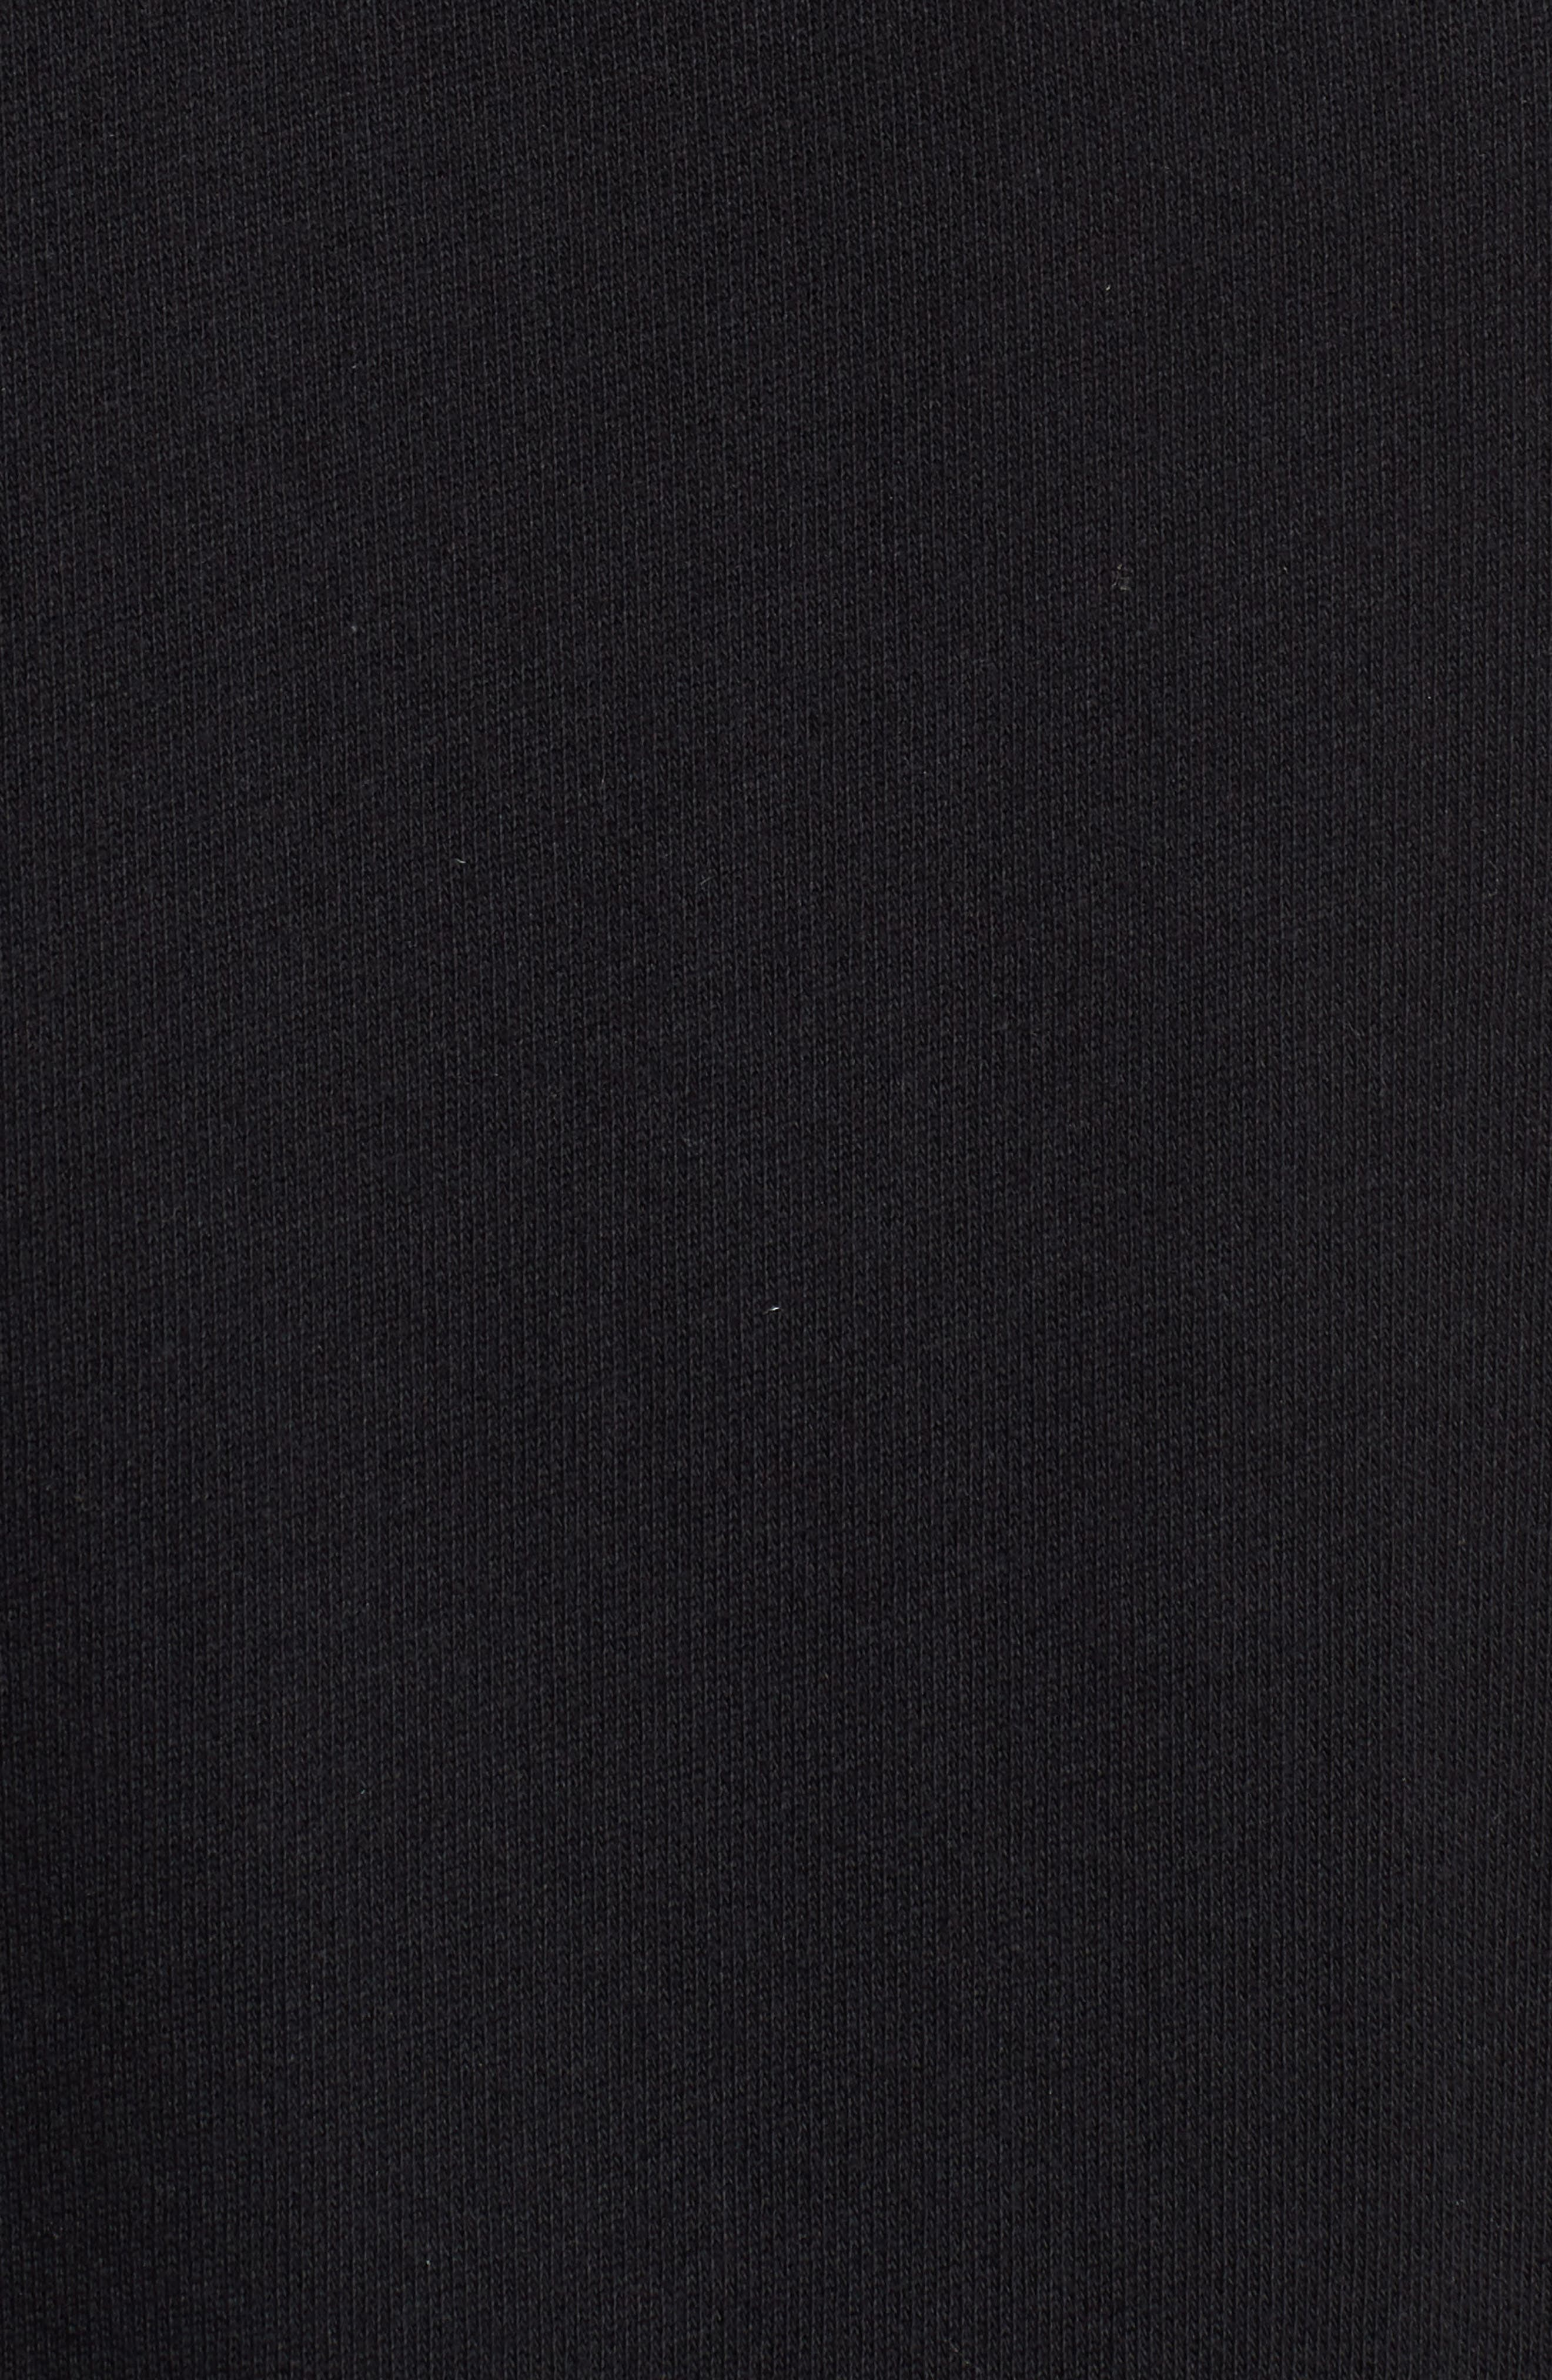 Off-Duty Mixed Media Cotton Top,                             Alternate thumbnail 5, color,                             Black